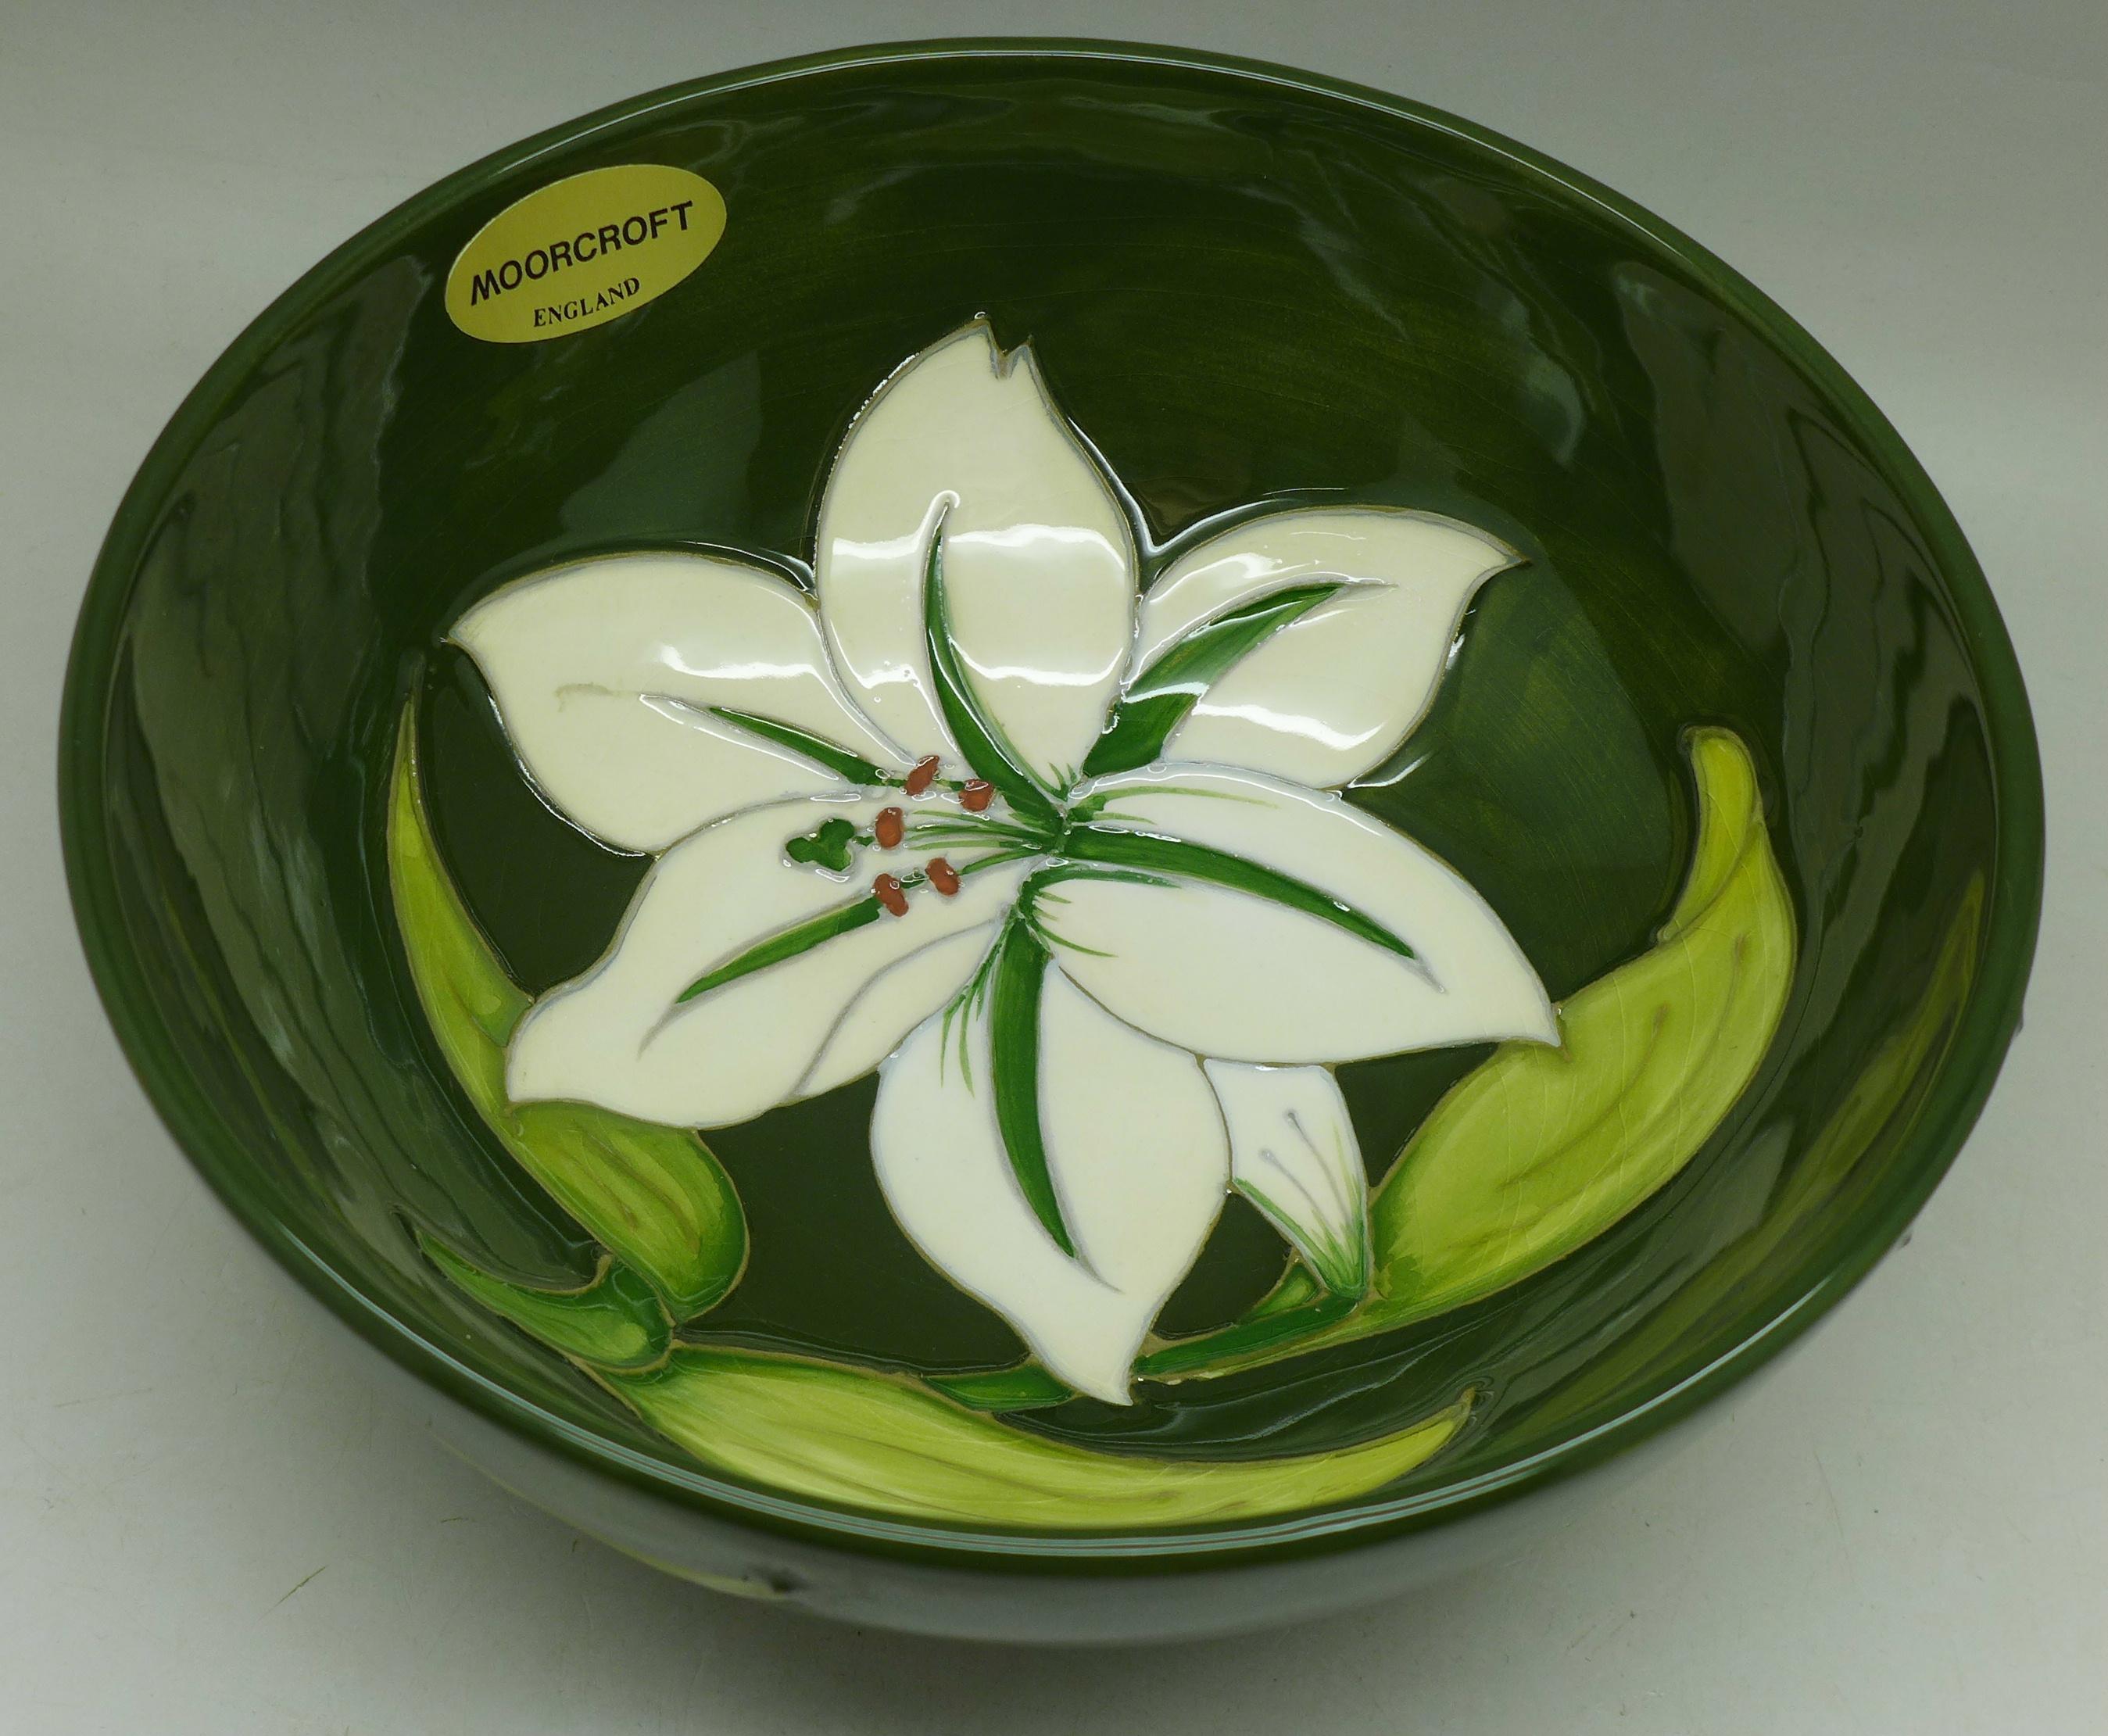 A Moorcroft Bermuda Lily bowl, 163mm diameter - Image 2 of 6